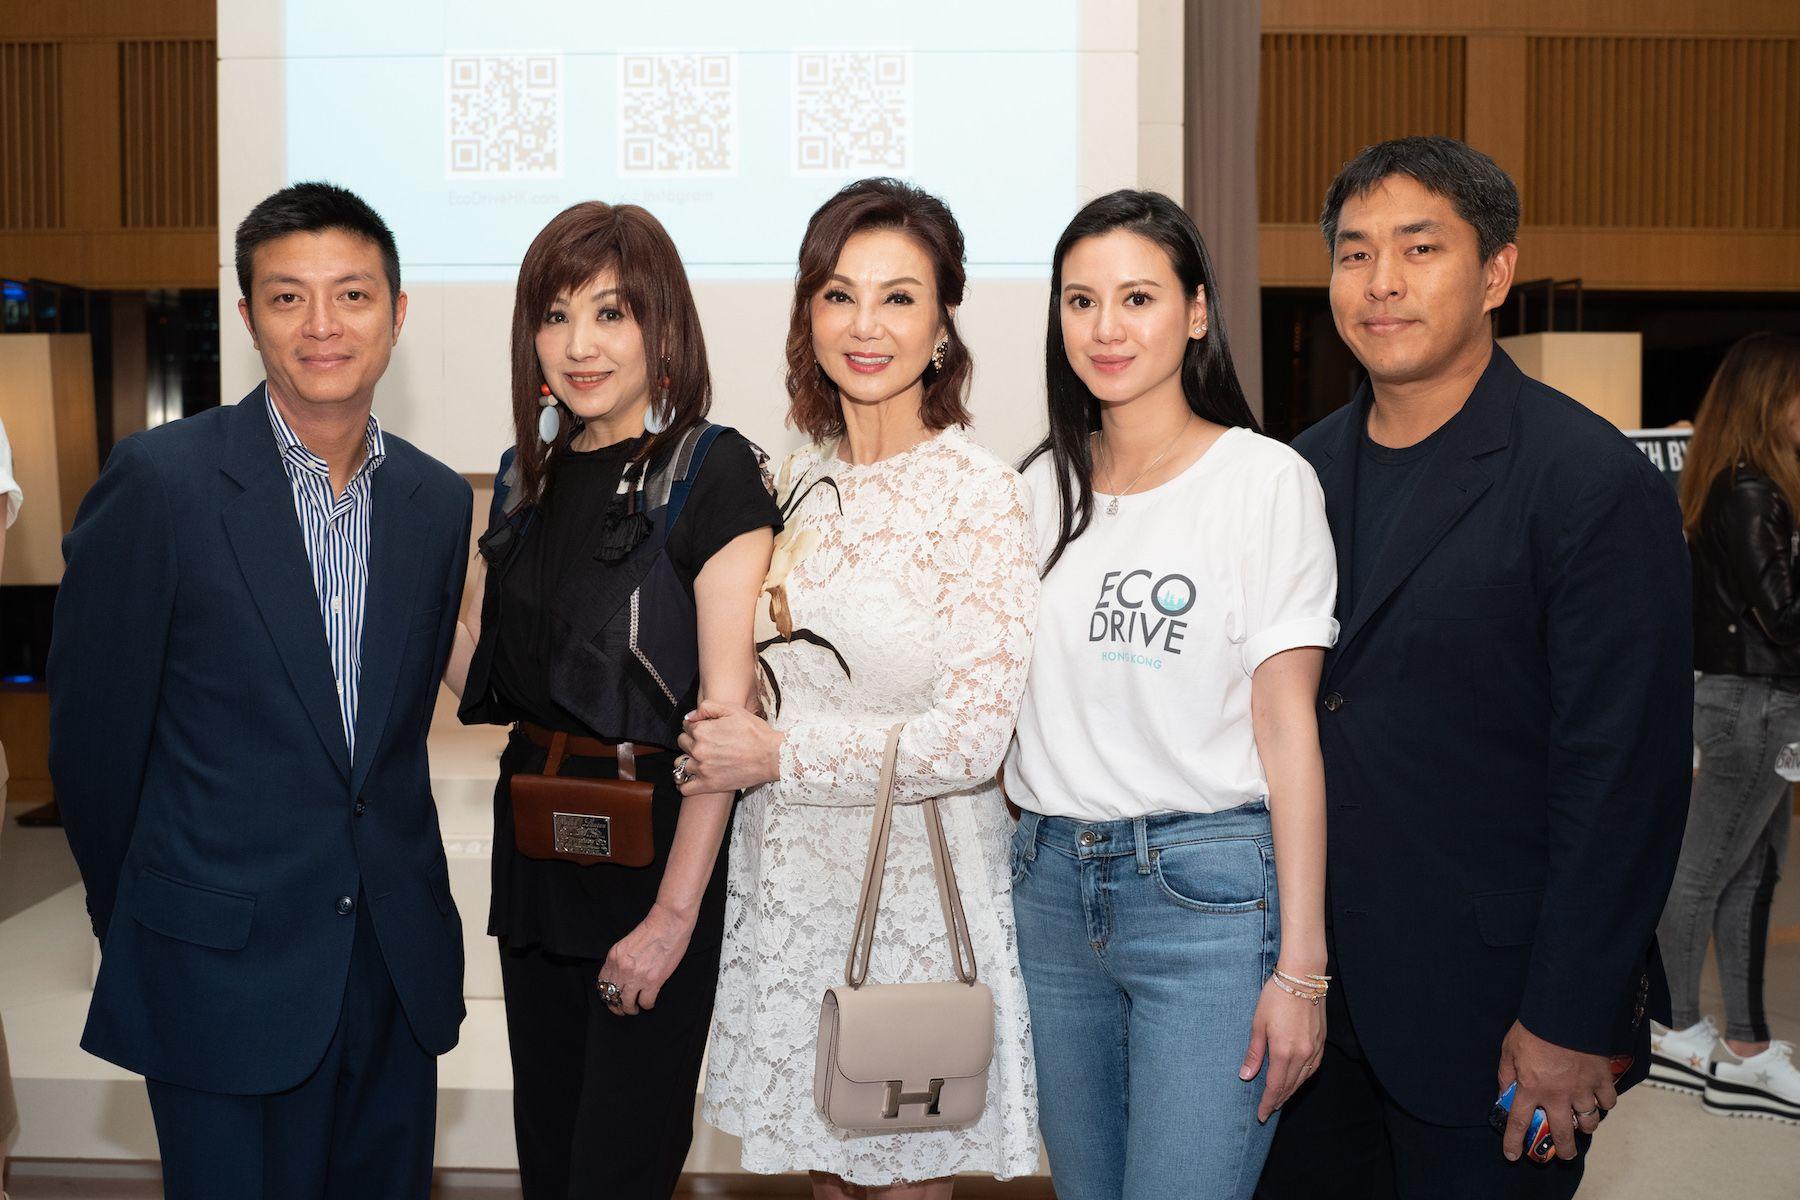 Lester Lam, Jo Jo Fok, Lynn Hsieh, Emily Lam-Ho, Kent Ho